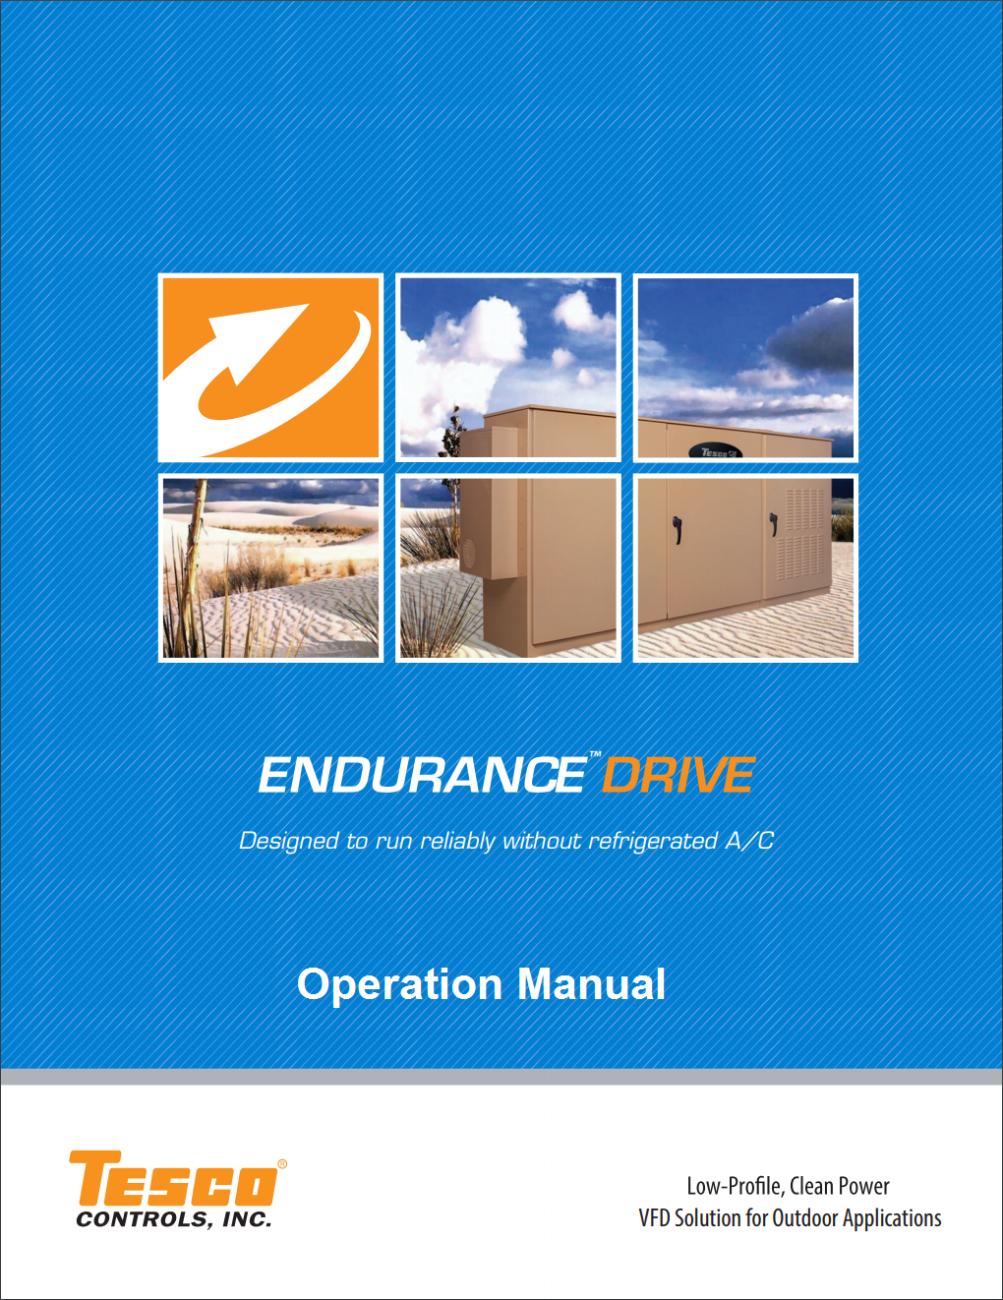 Endurance Drive